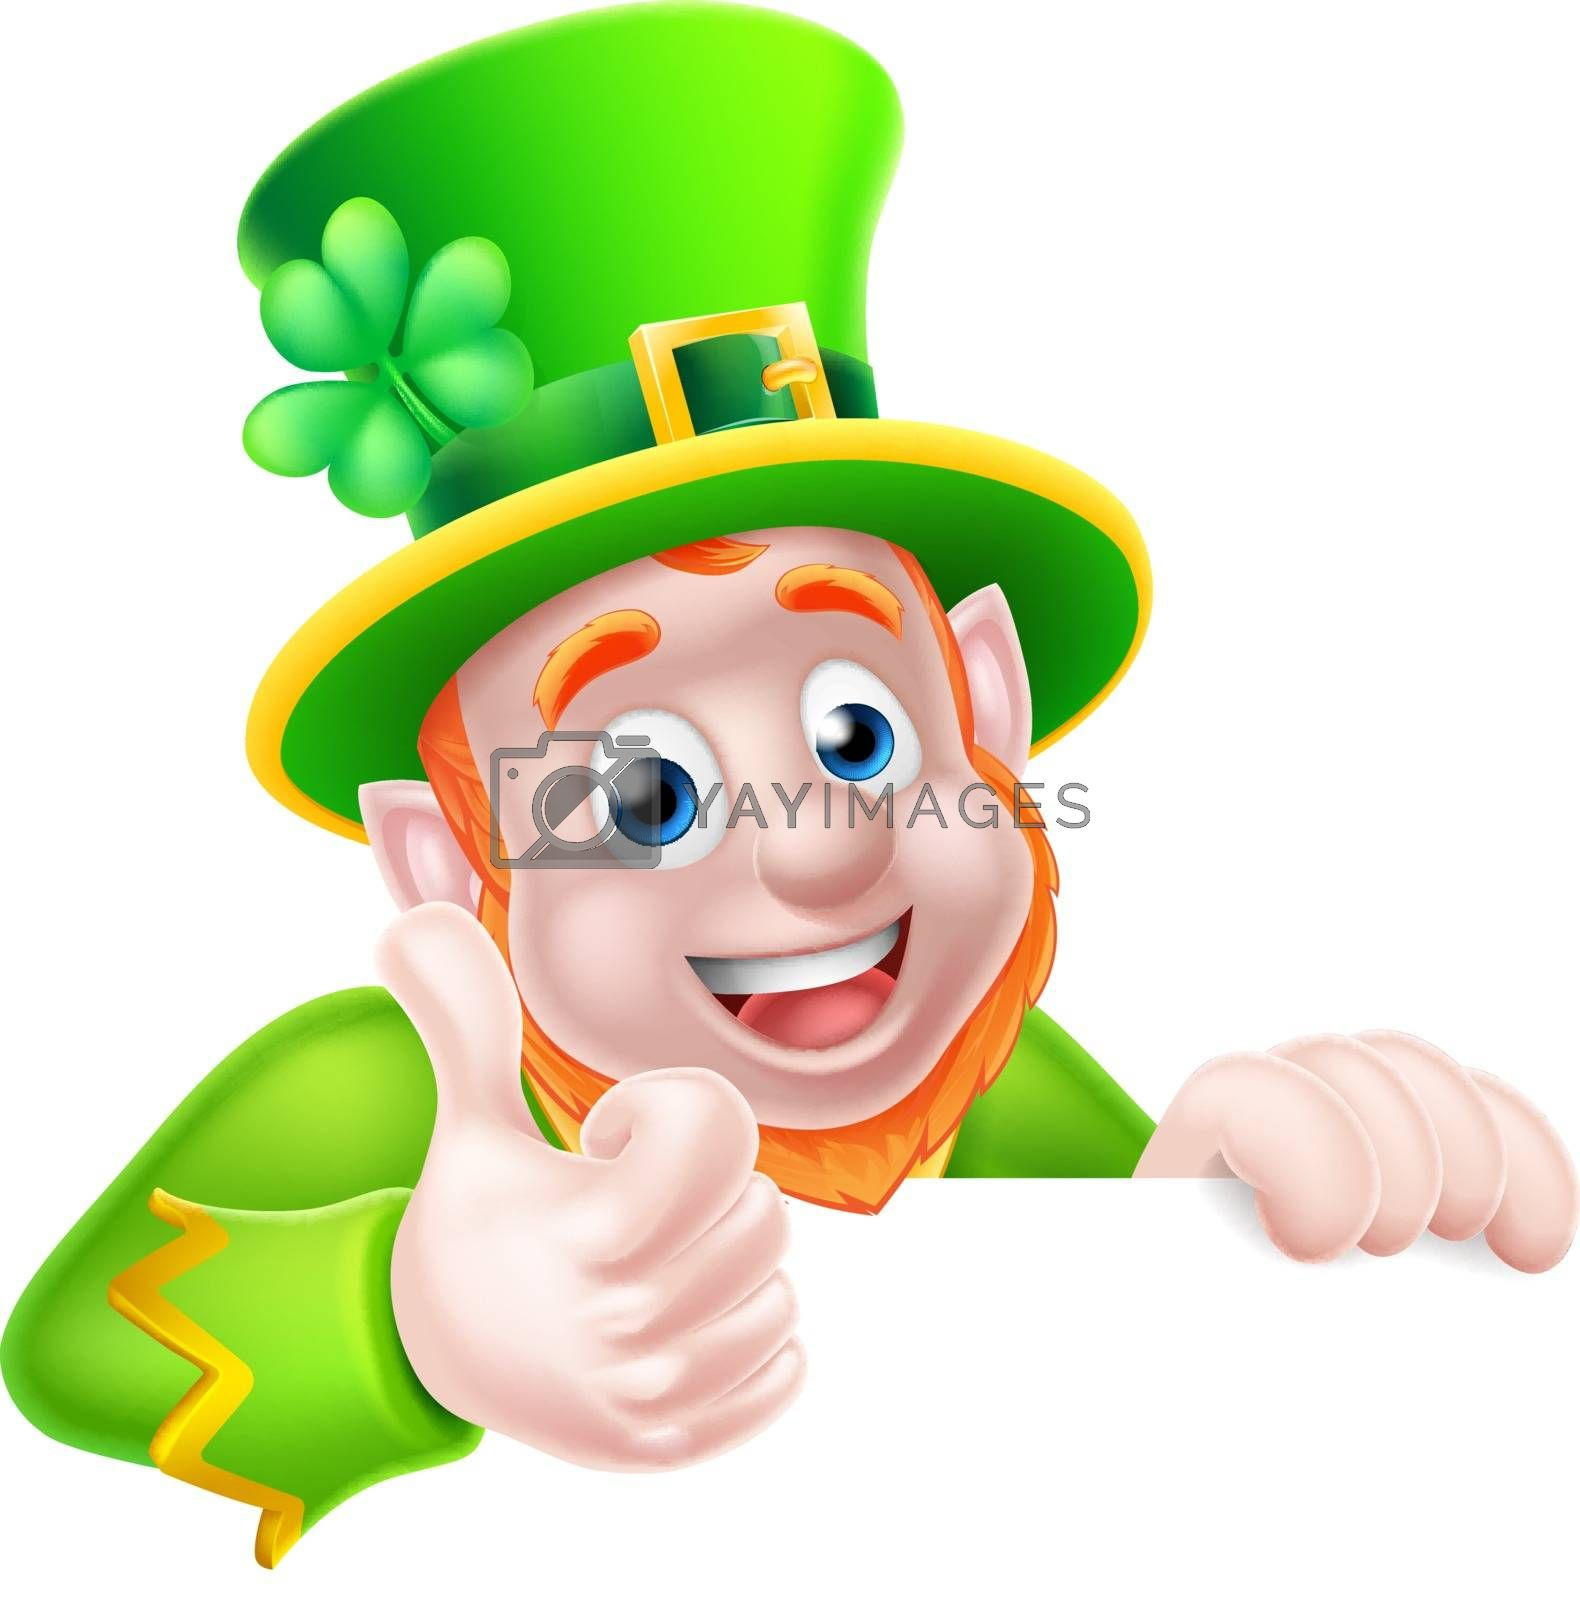 Leprechaun cartoon character peeking above a sign and giving a thumbs up